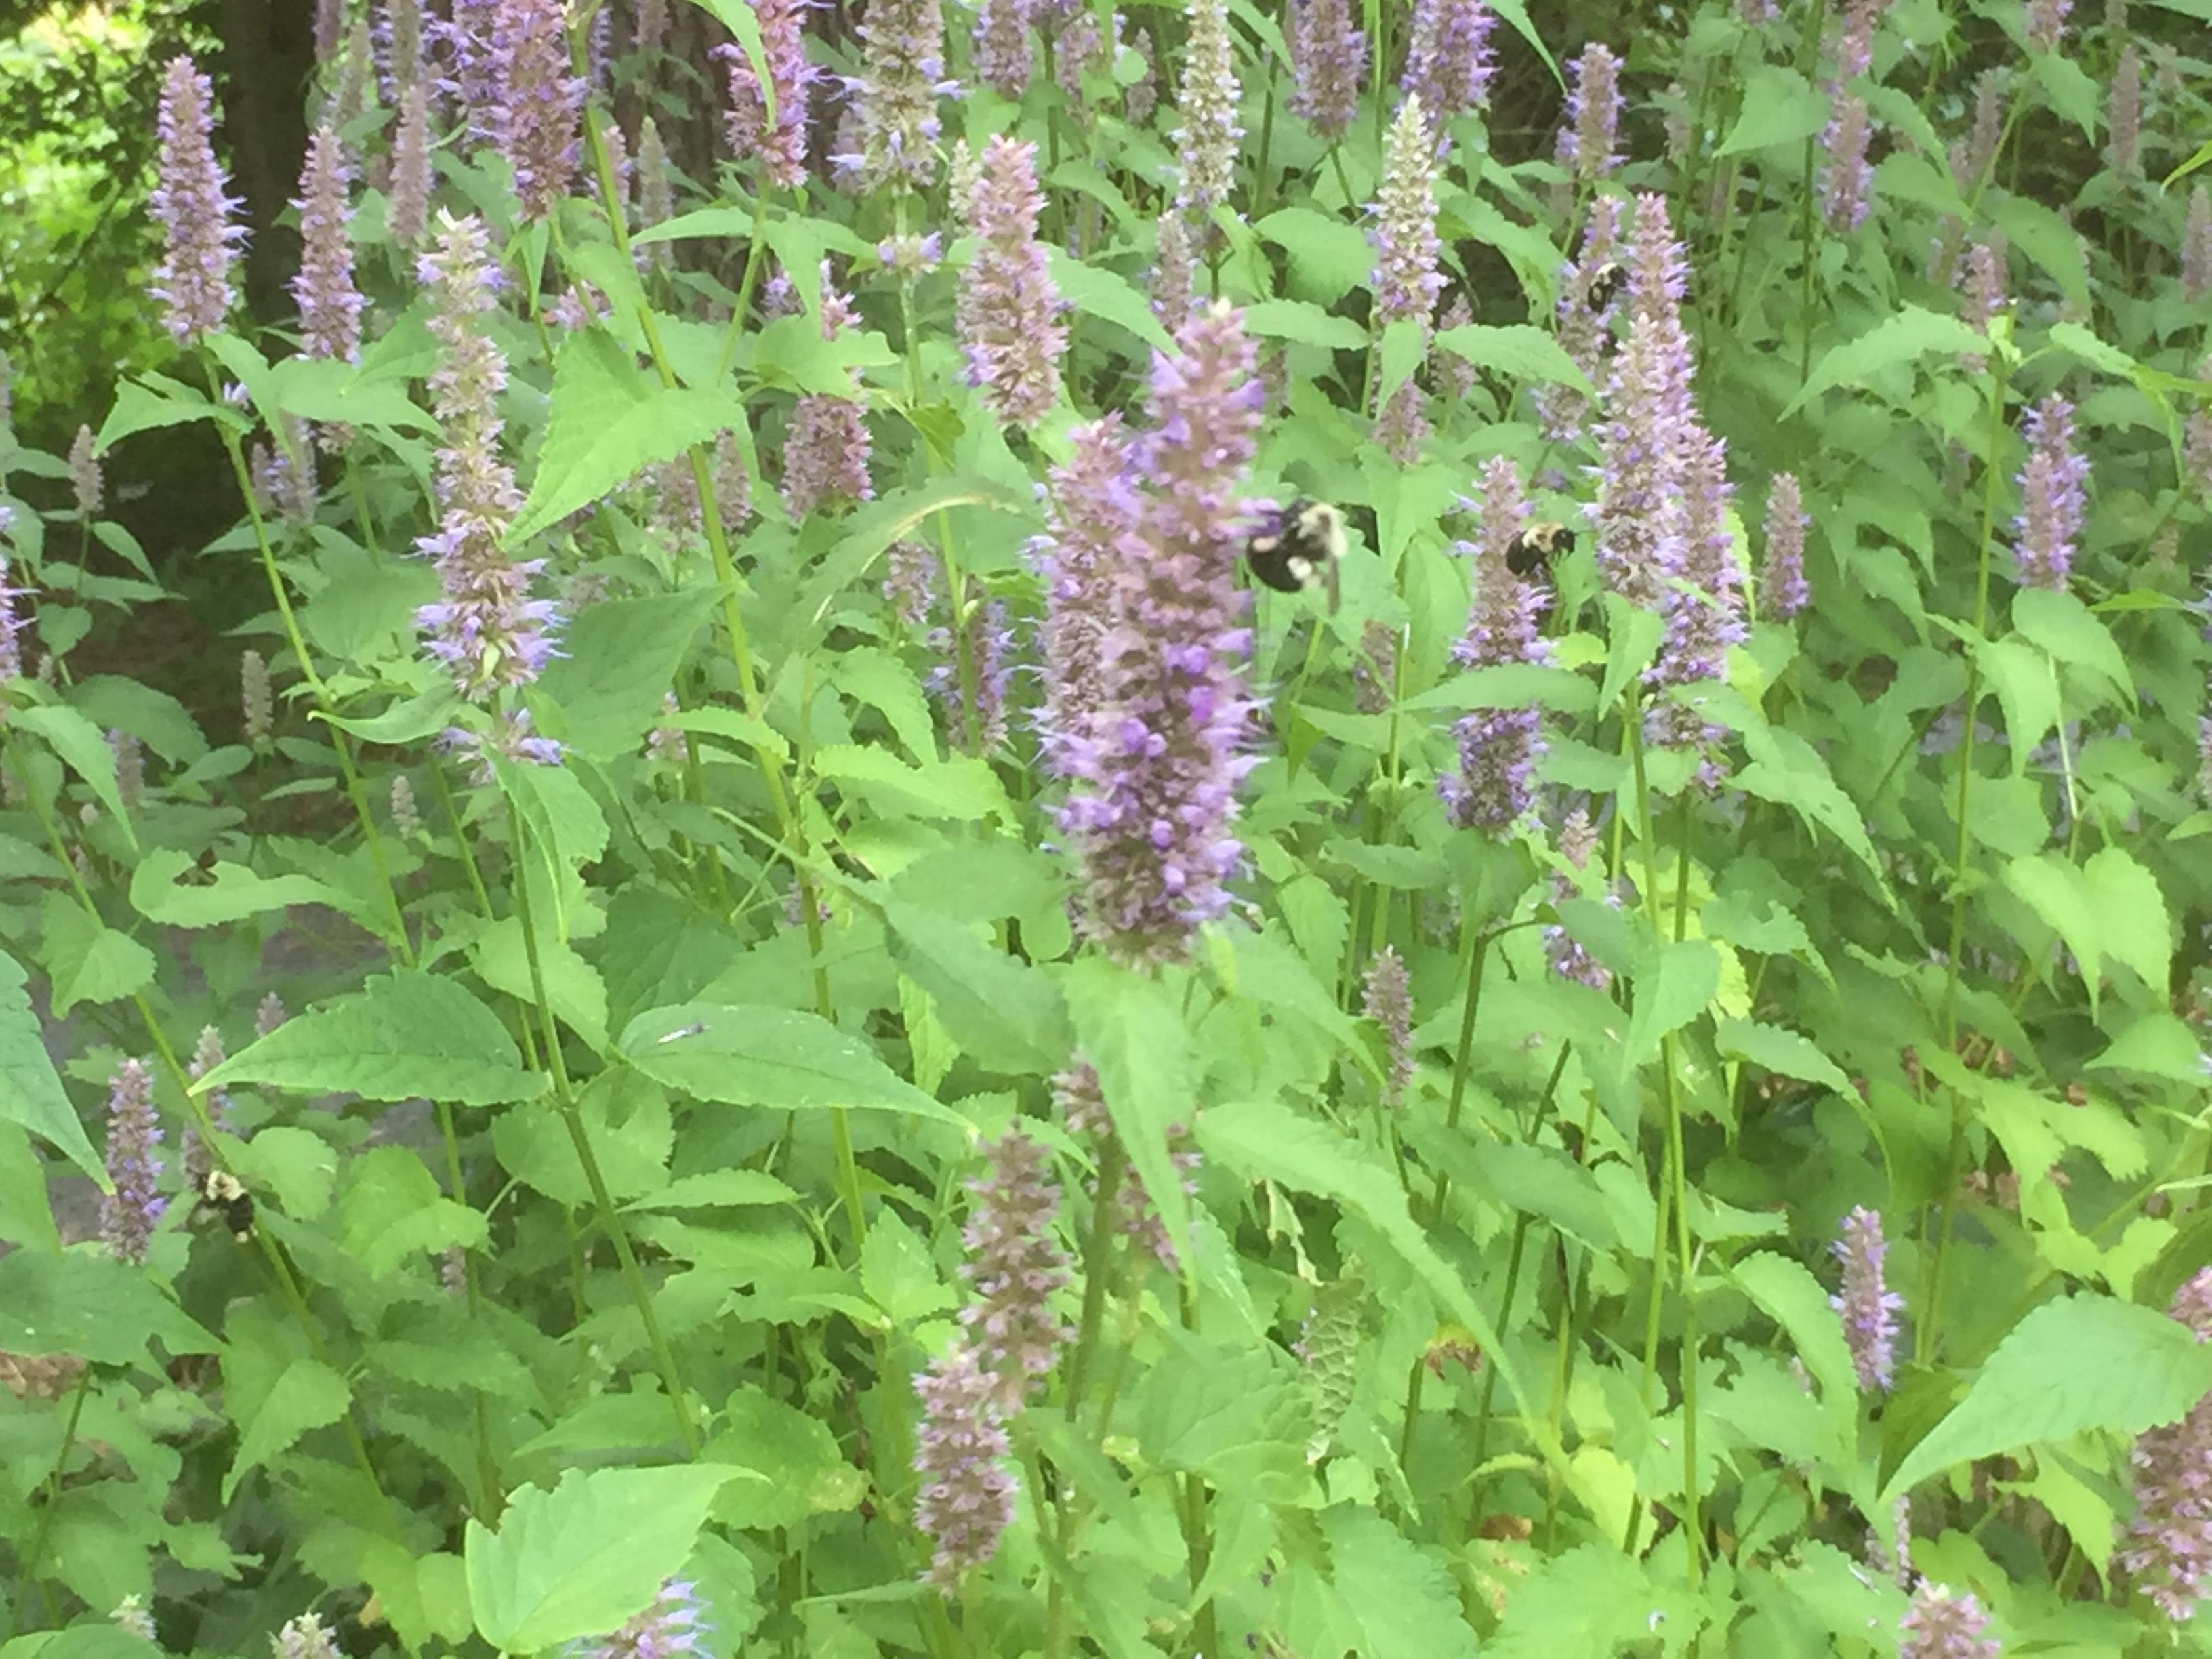 Summer Flowers-Fragrant Giant Hyssop